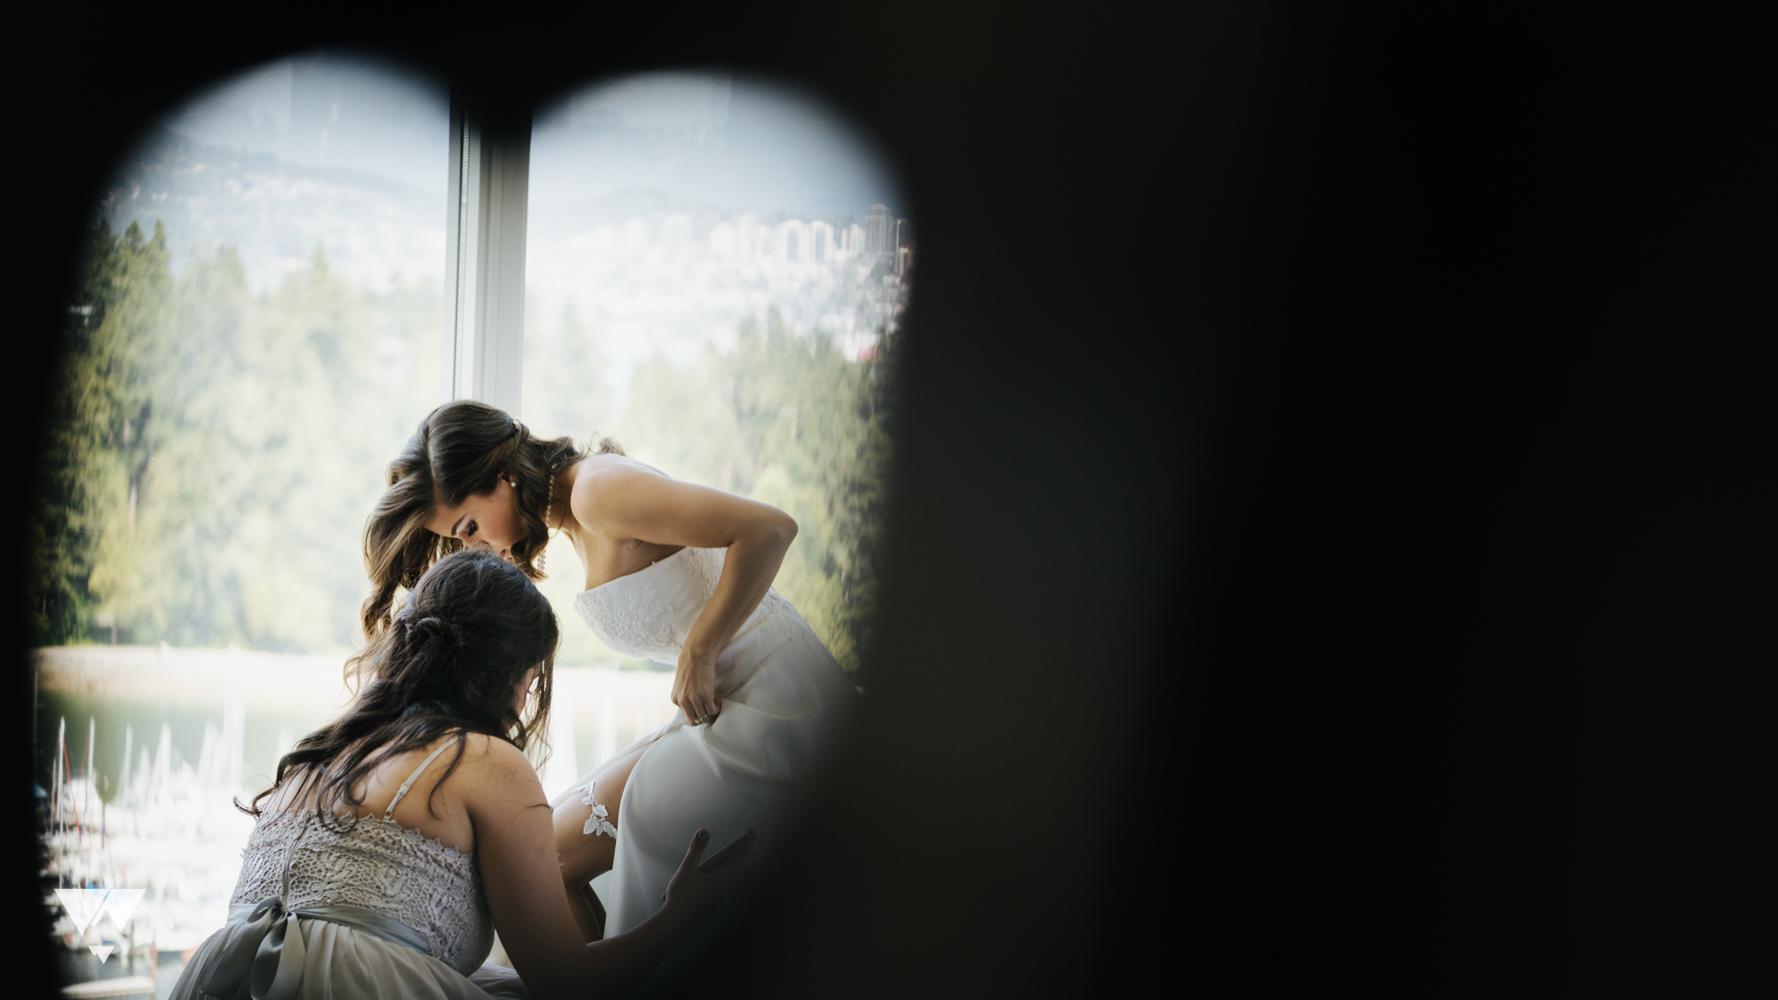 herastudios_wedding_sadaf_logan_hera_selects_web-12.jpg